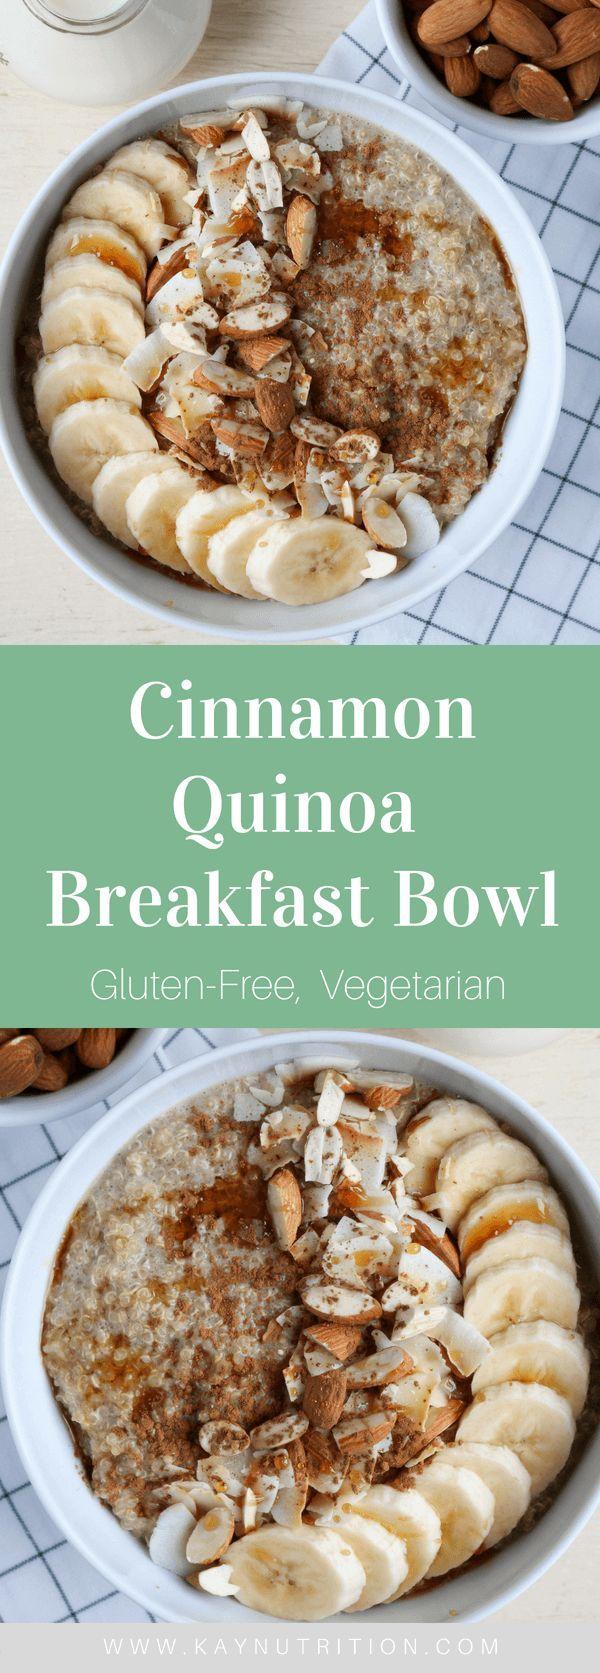 Cinnamon Quinoa Breakfast Bowl images